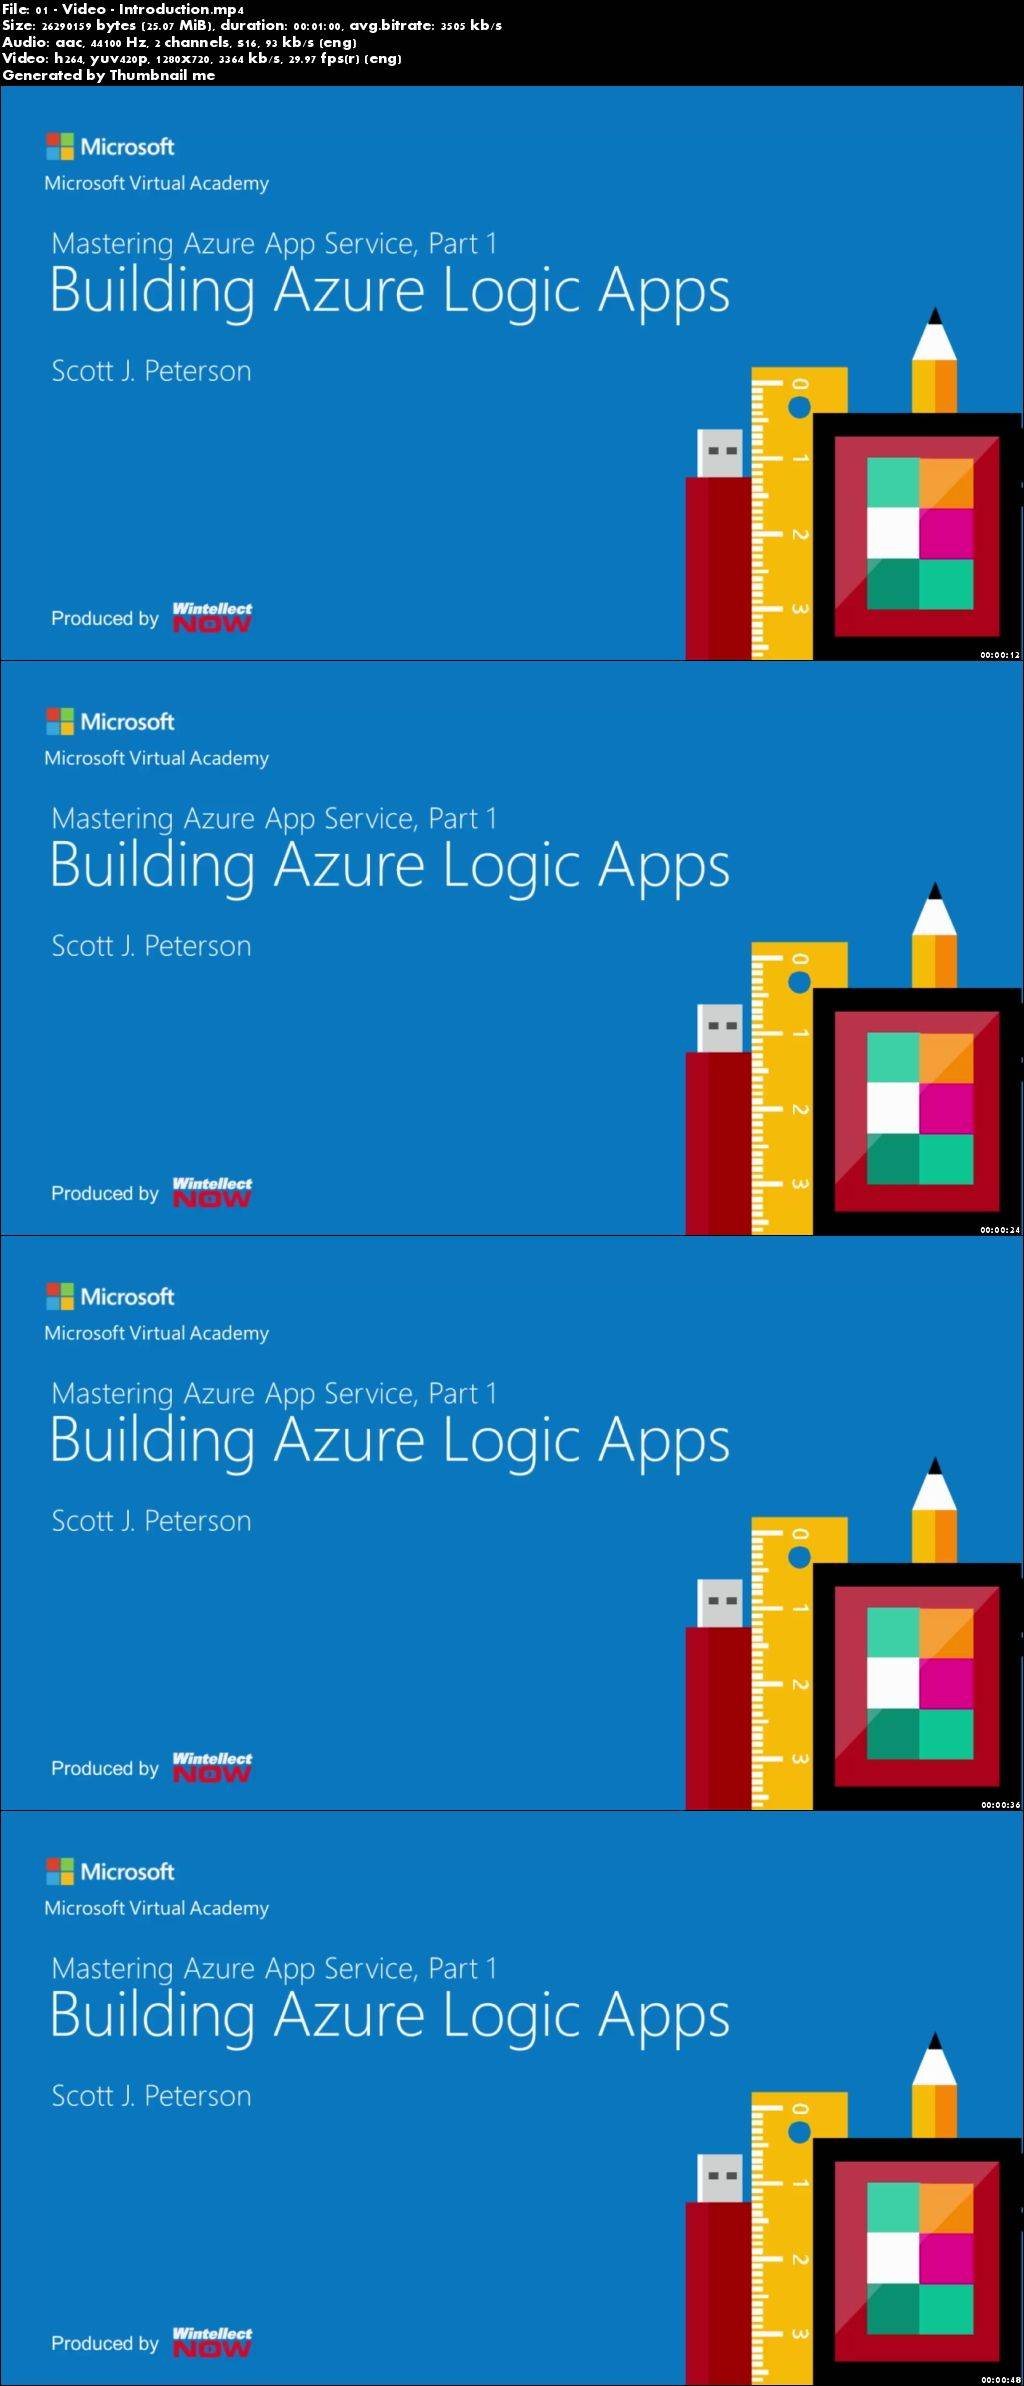 Mastering Azure App Service, Part 1: Building Azure Logic